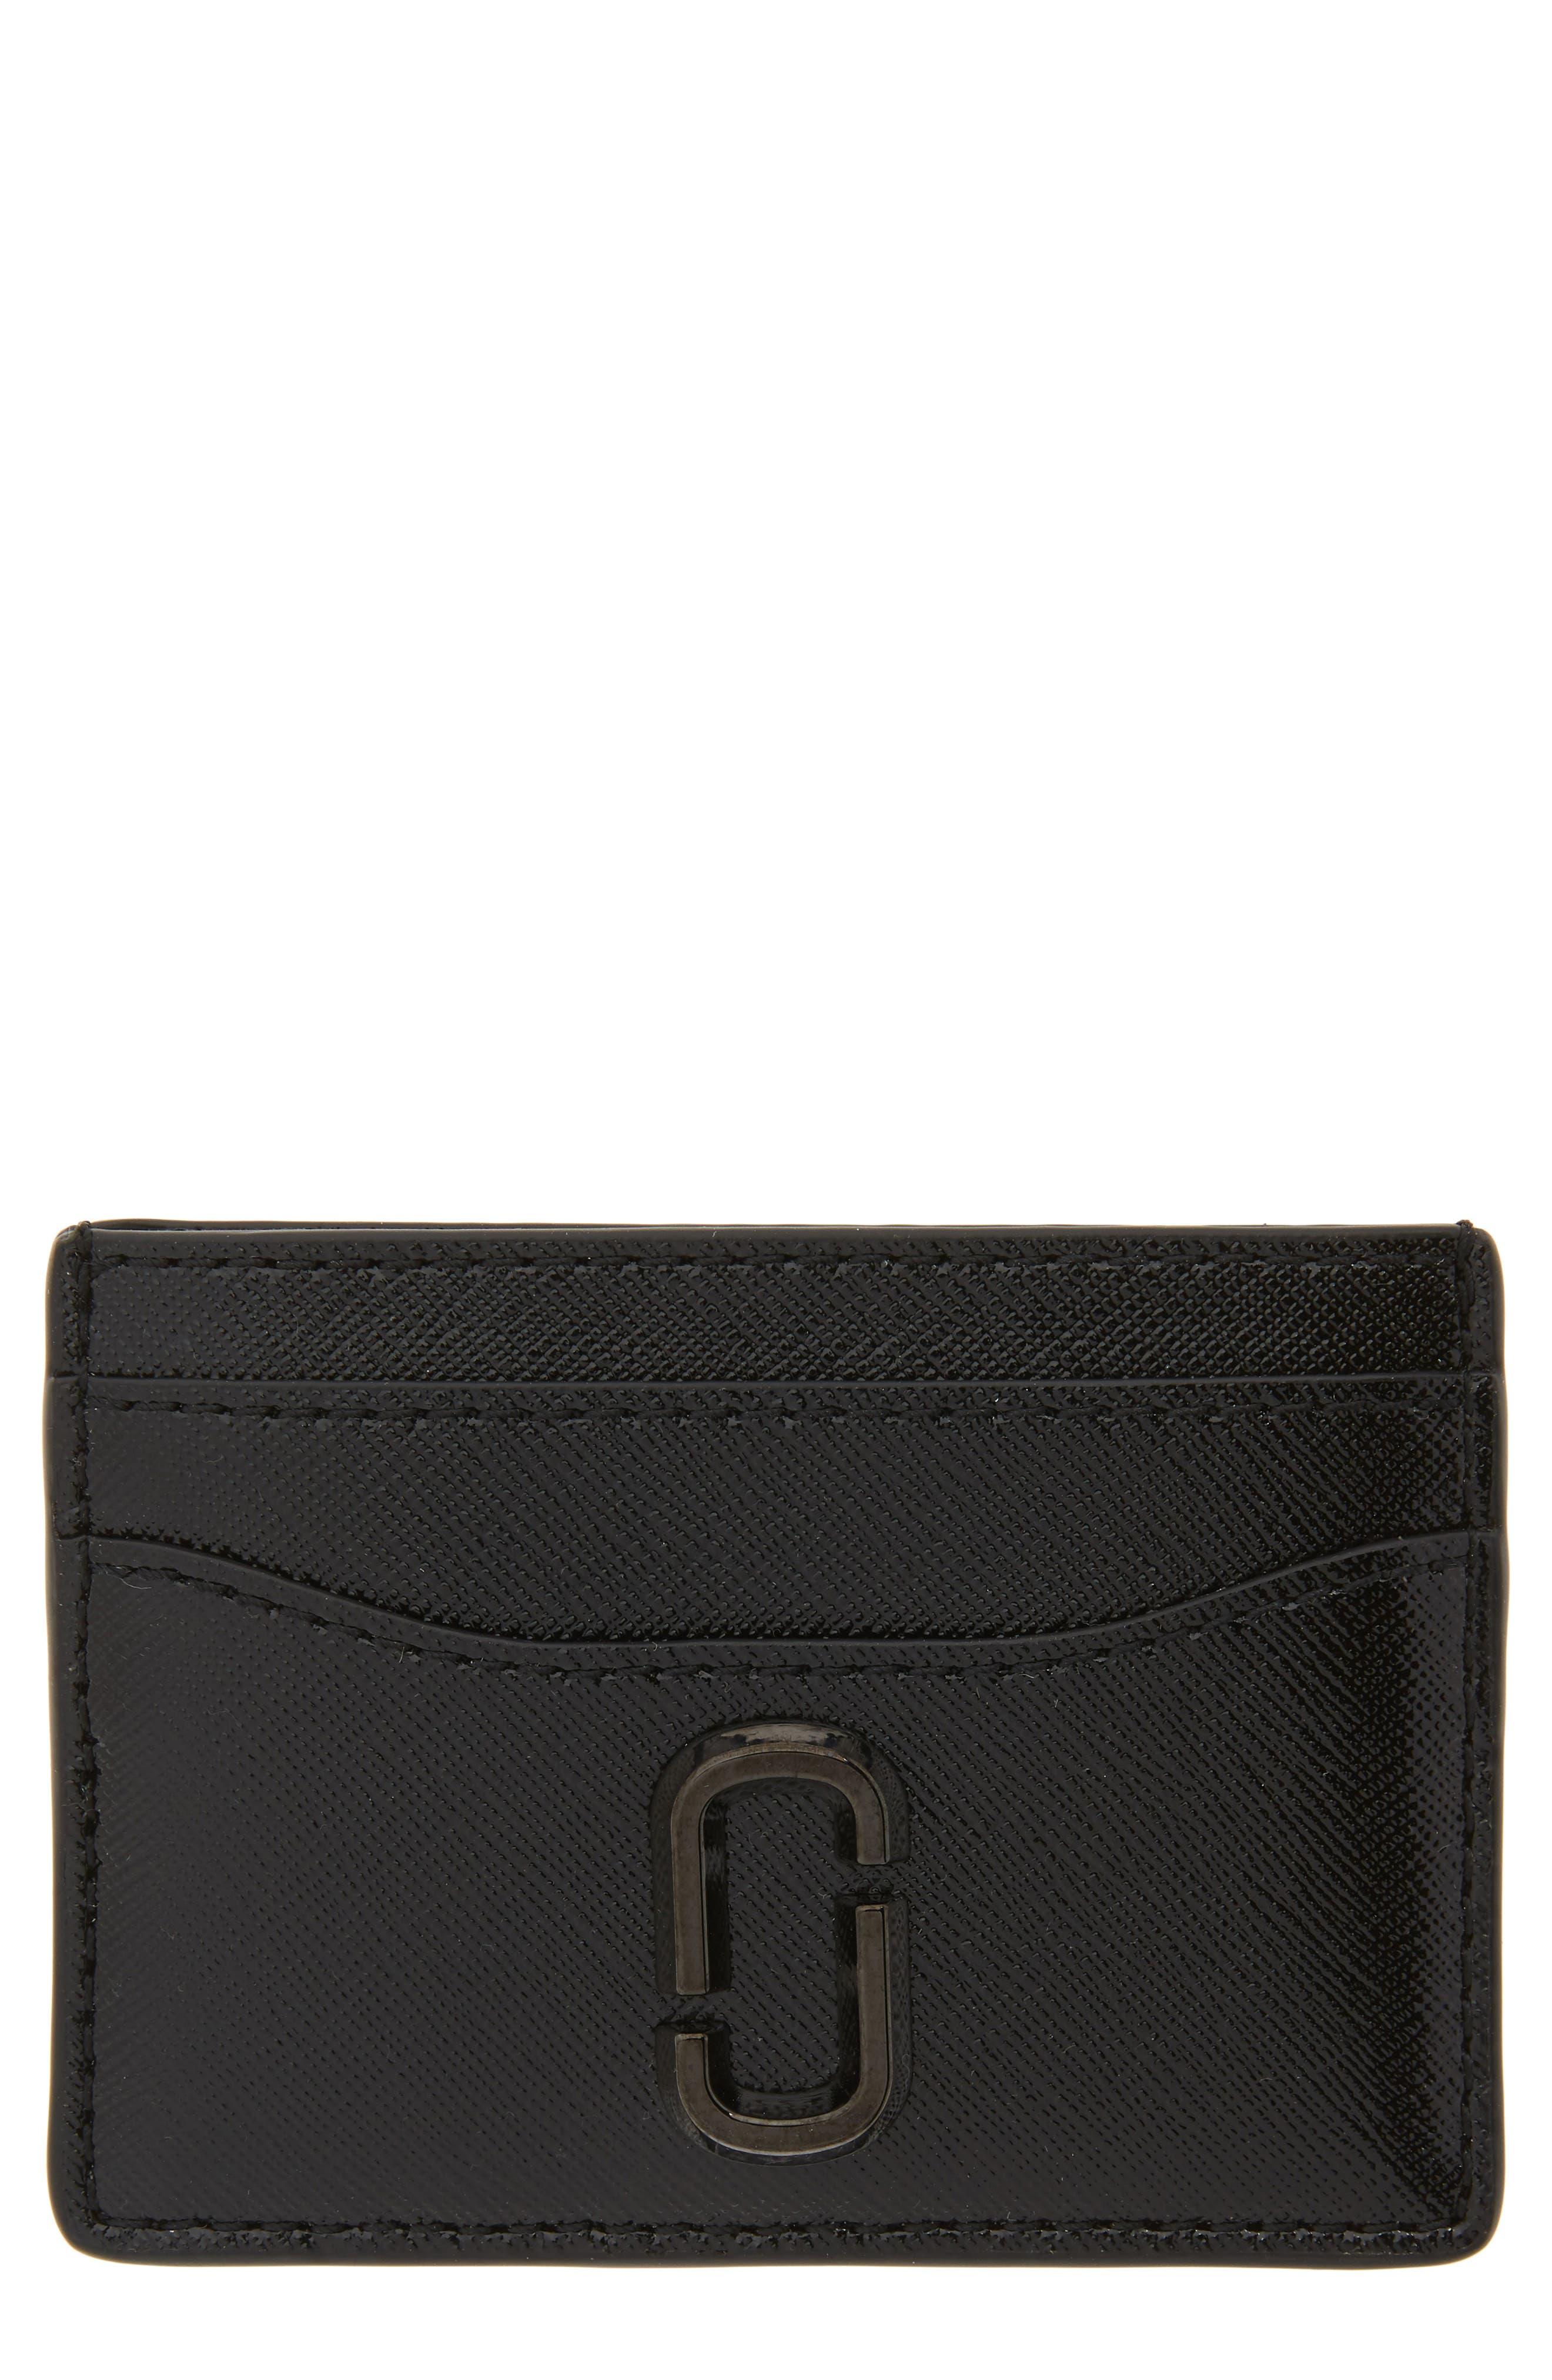 Snapshot Leather Card Case, Main, color, BLACK